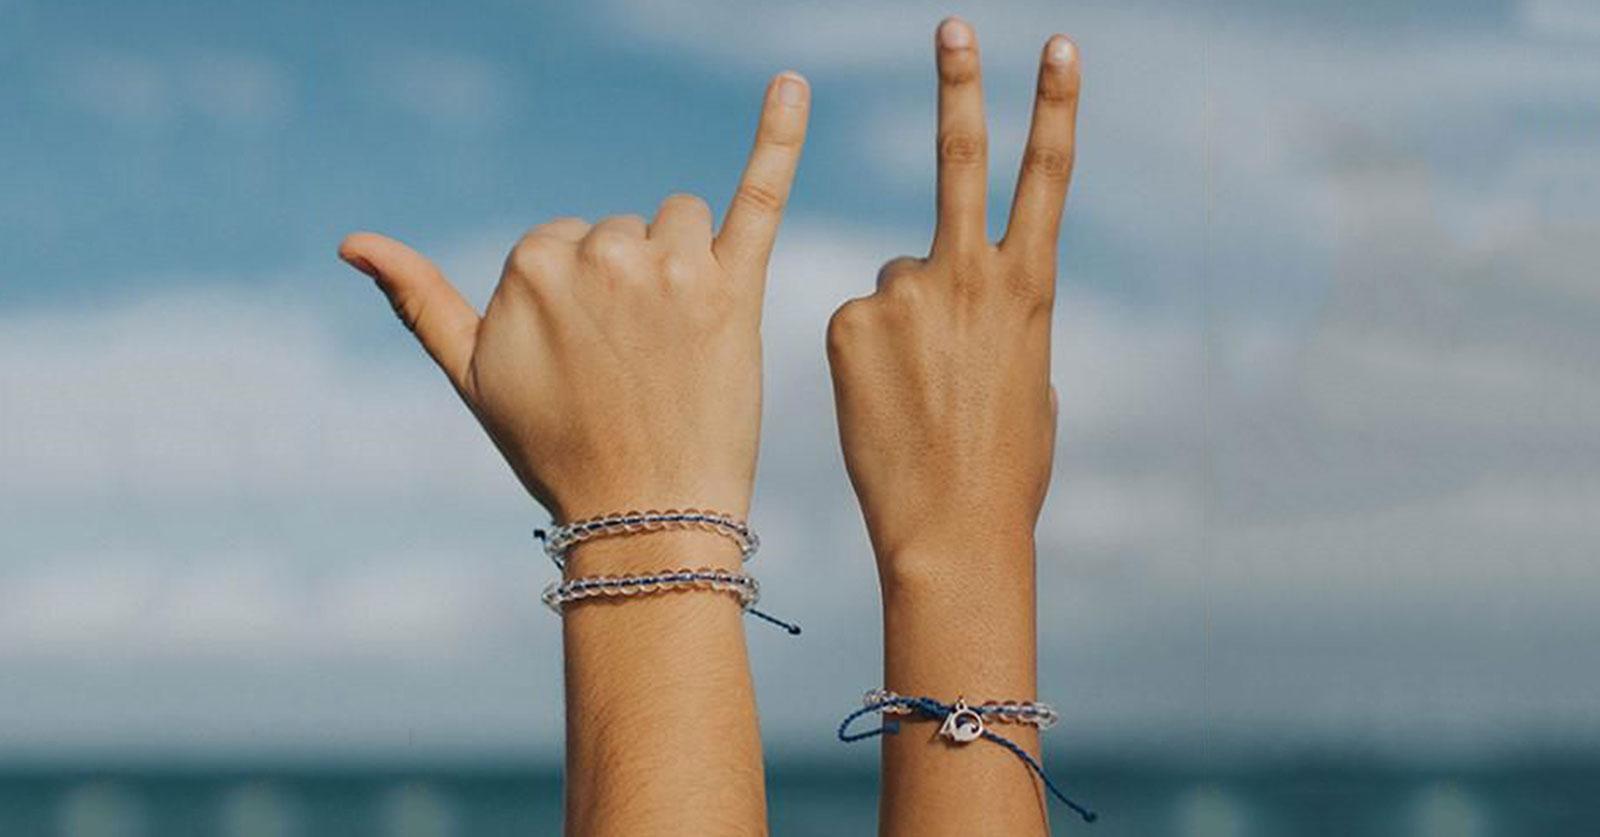 bracelets-1494956315895.jpg